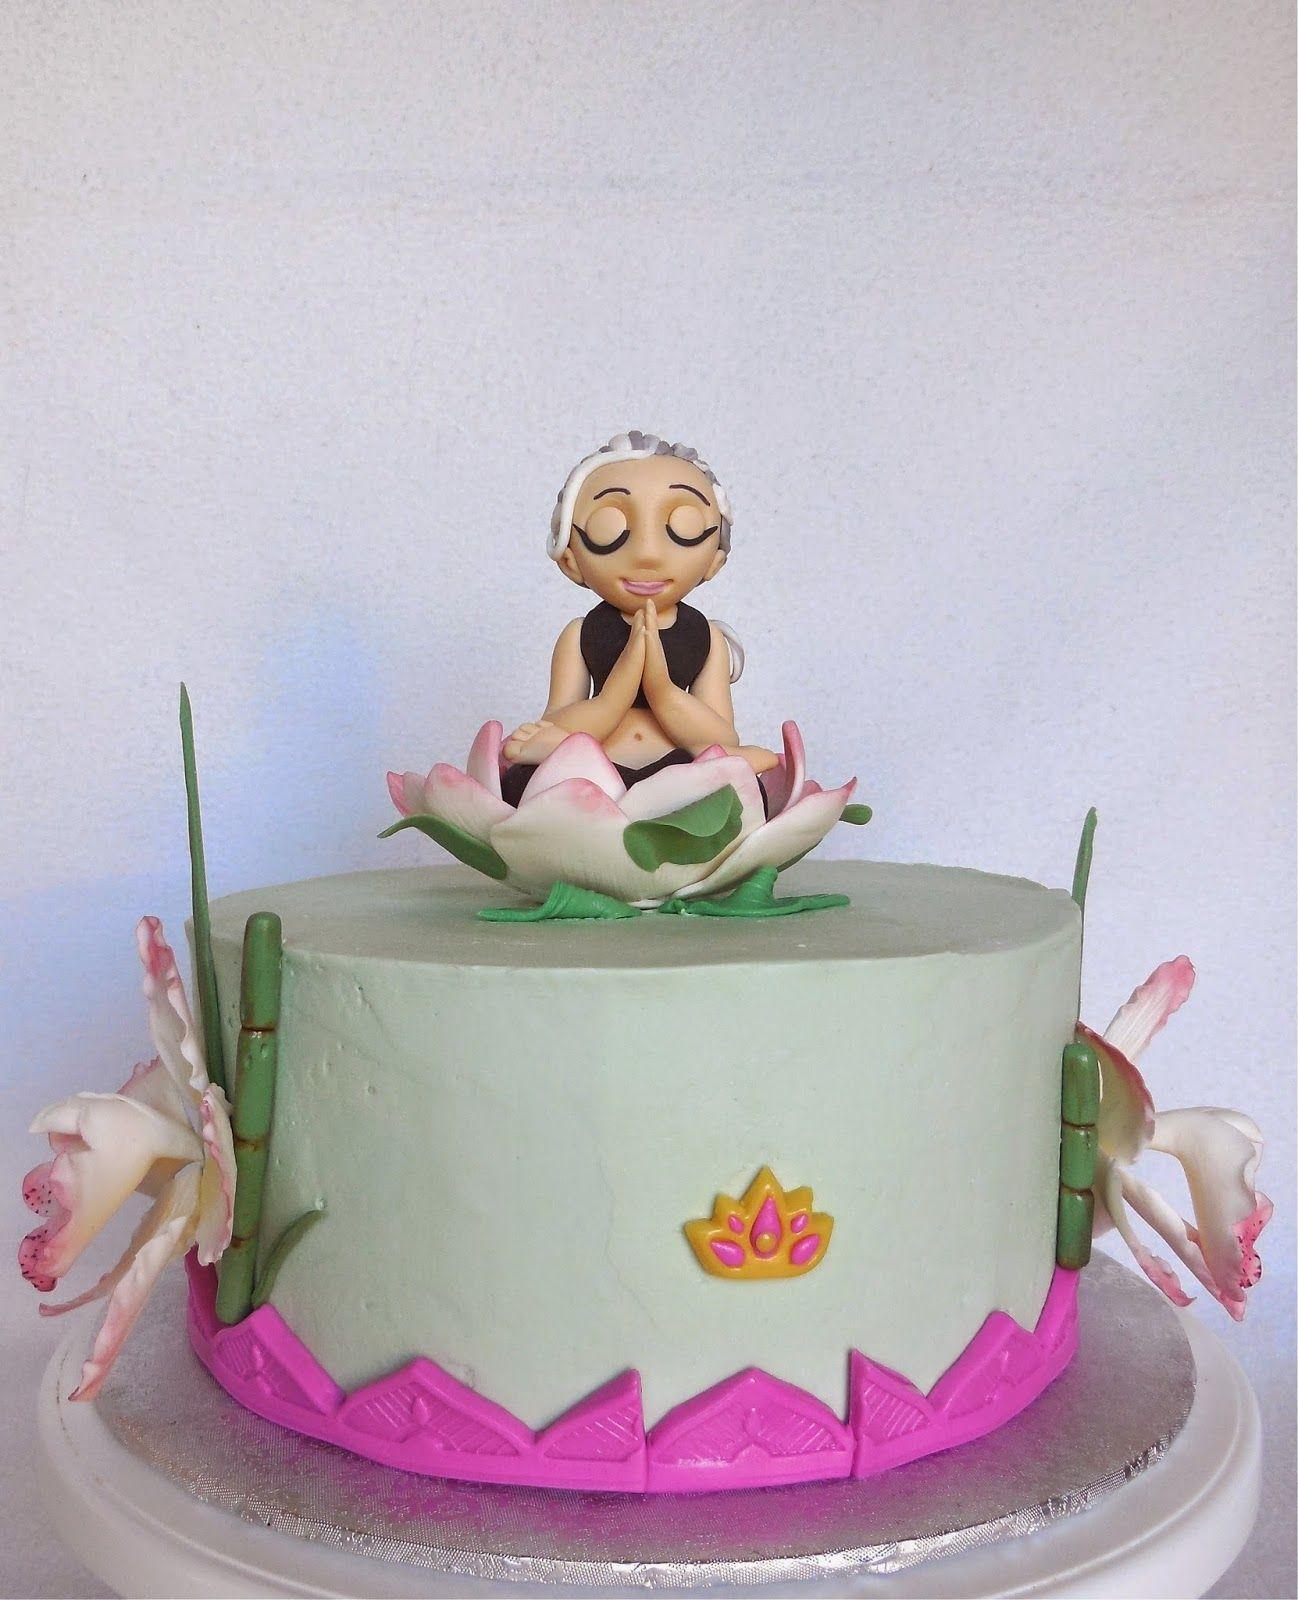 Custom Cakes by Lori: Yoga birthday cake for an eighty ...